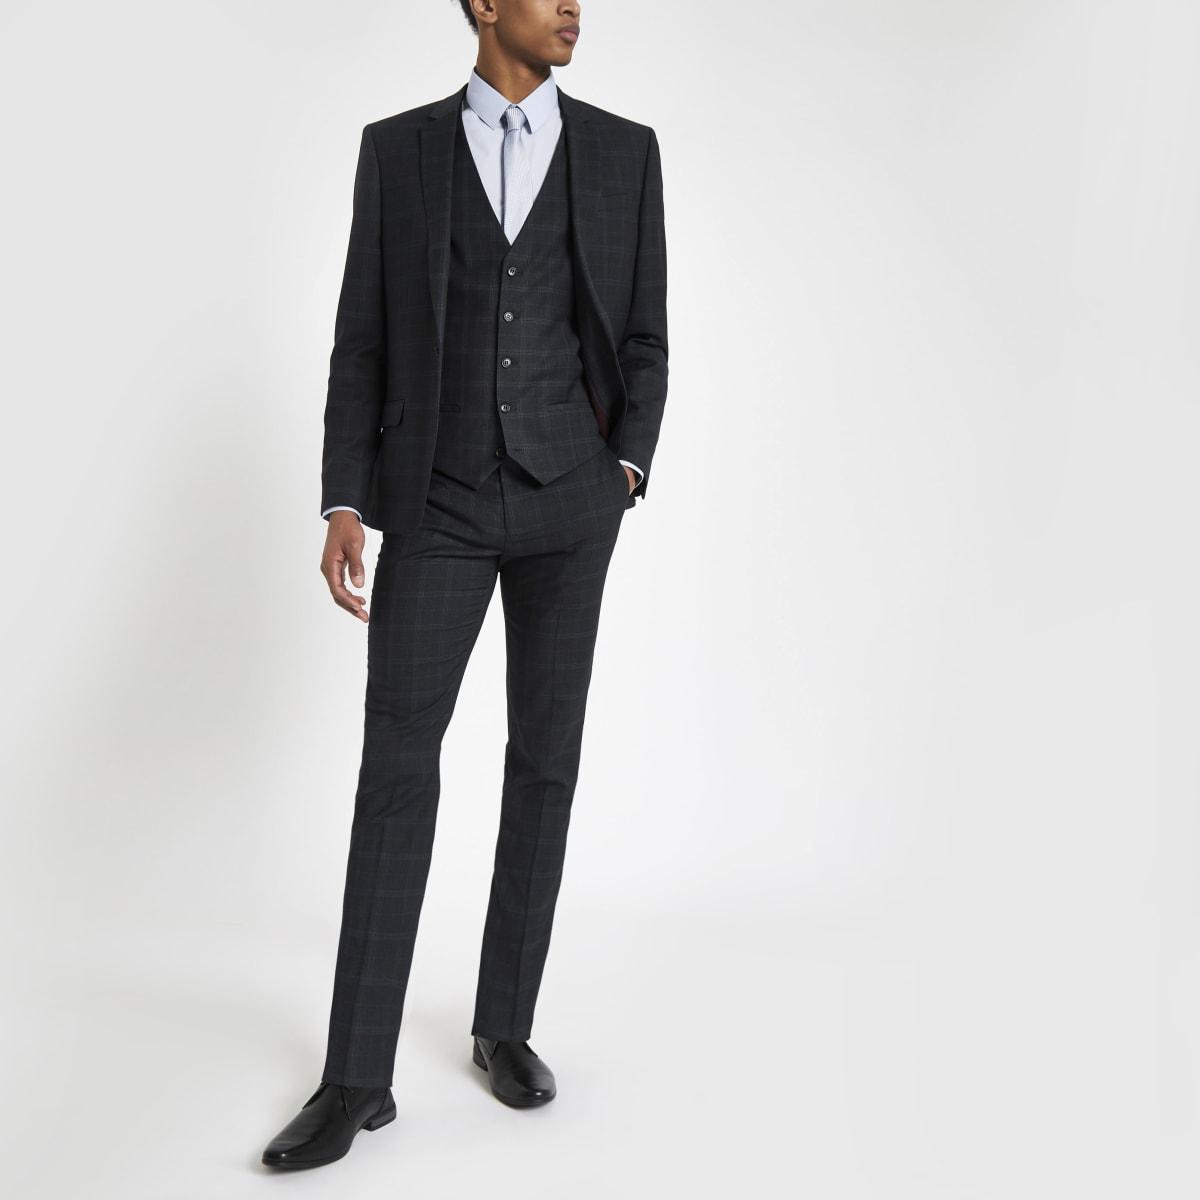 Marineblauwe geruite skinny-fit pantalon